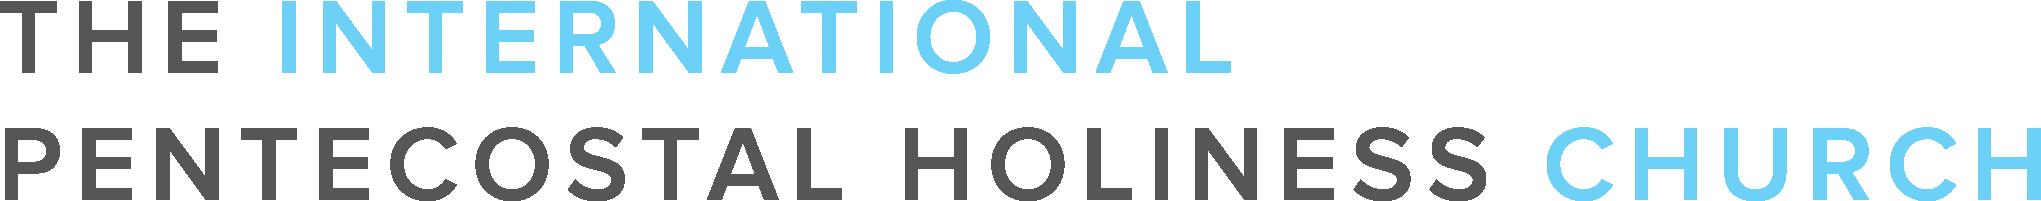 the international pentecostal holiness church